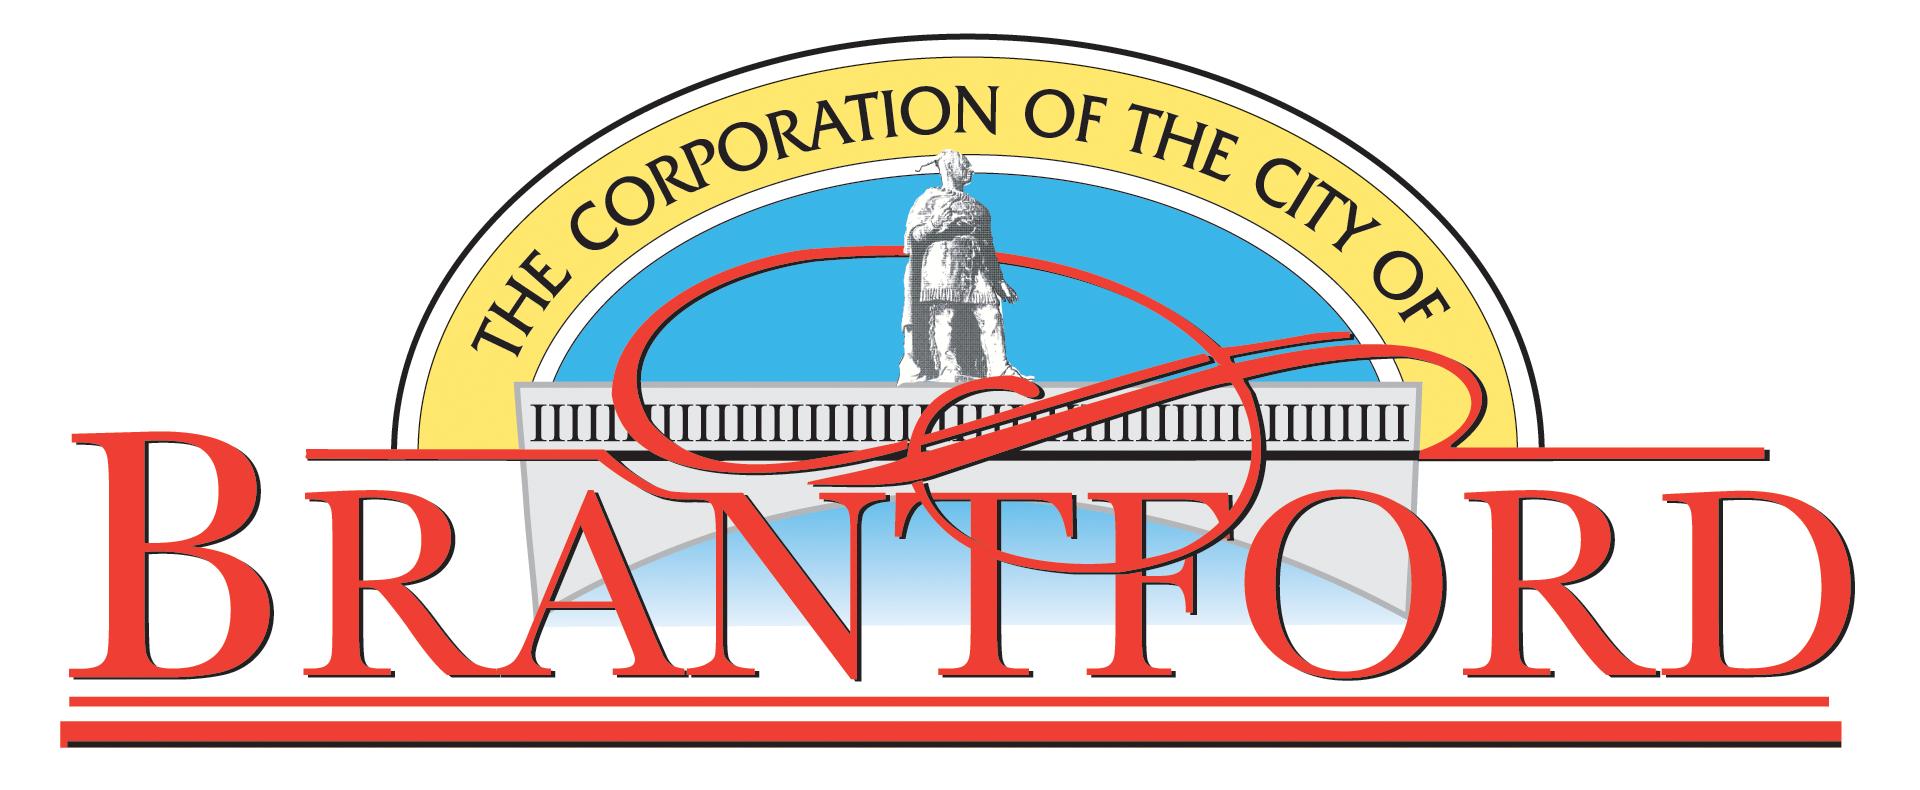 City of Brantford.png